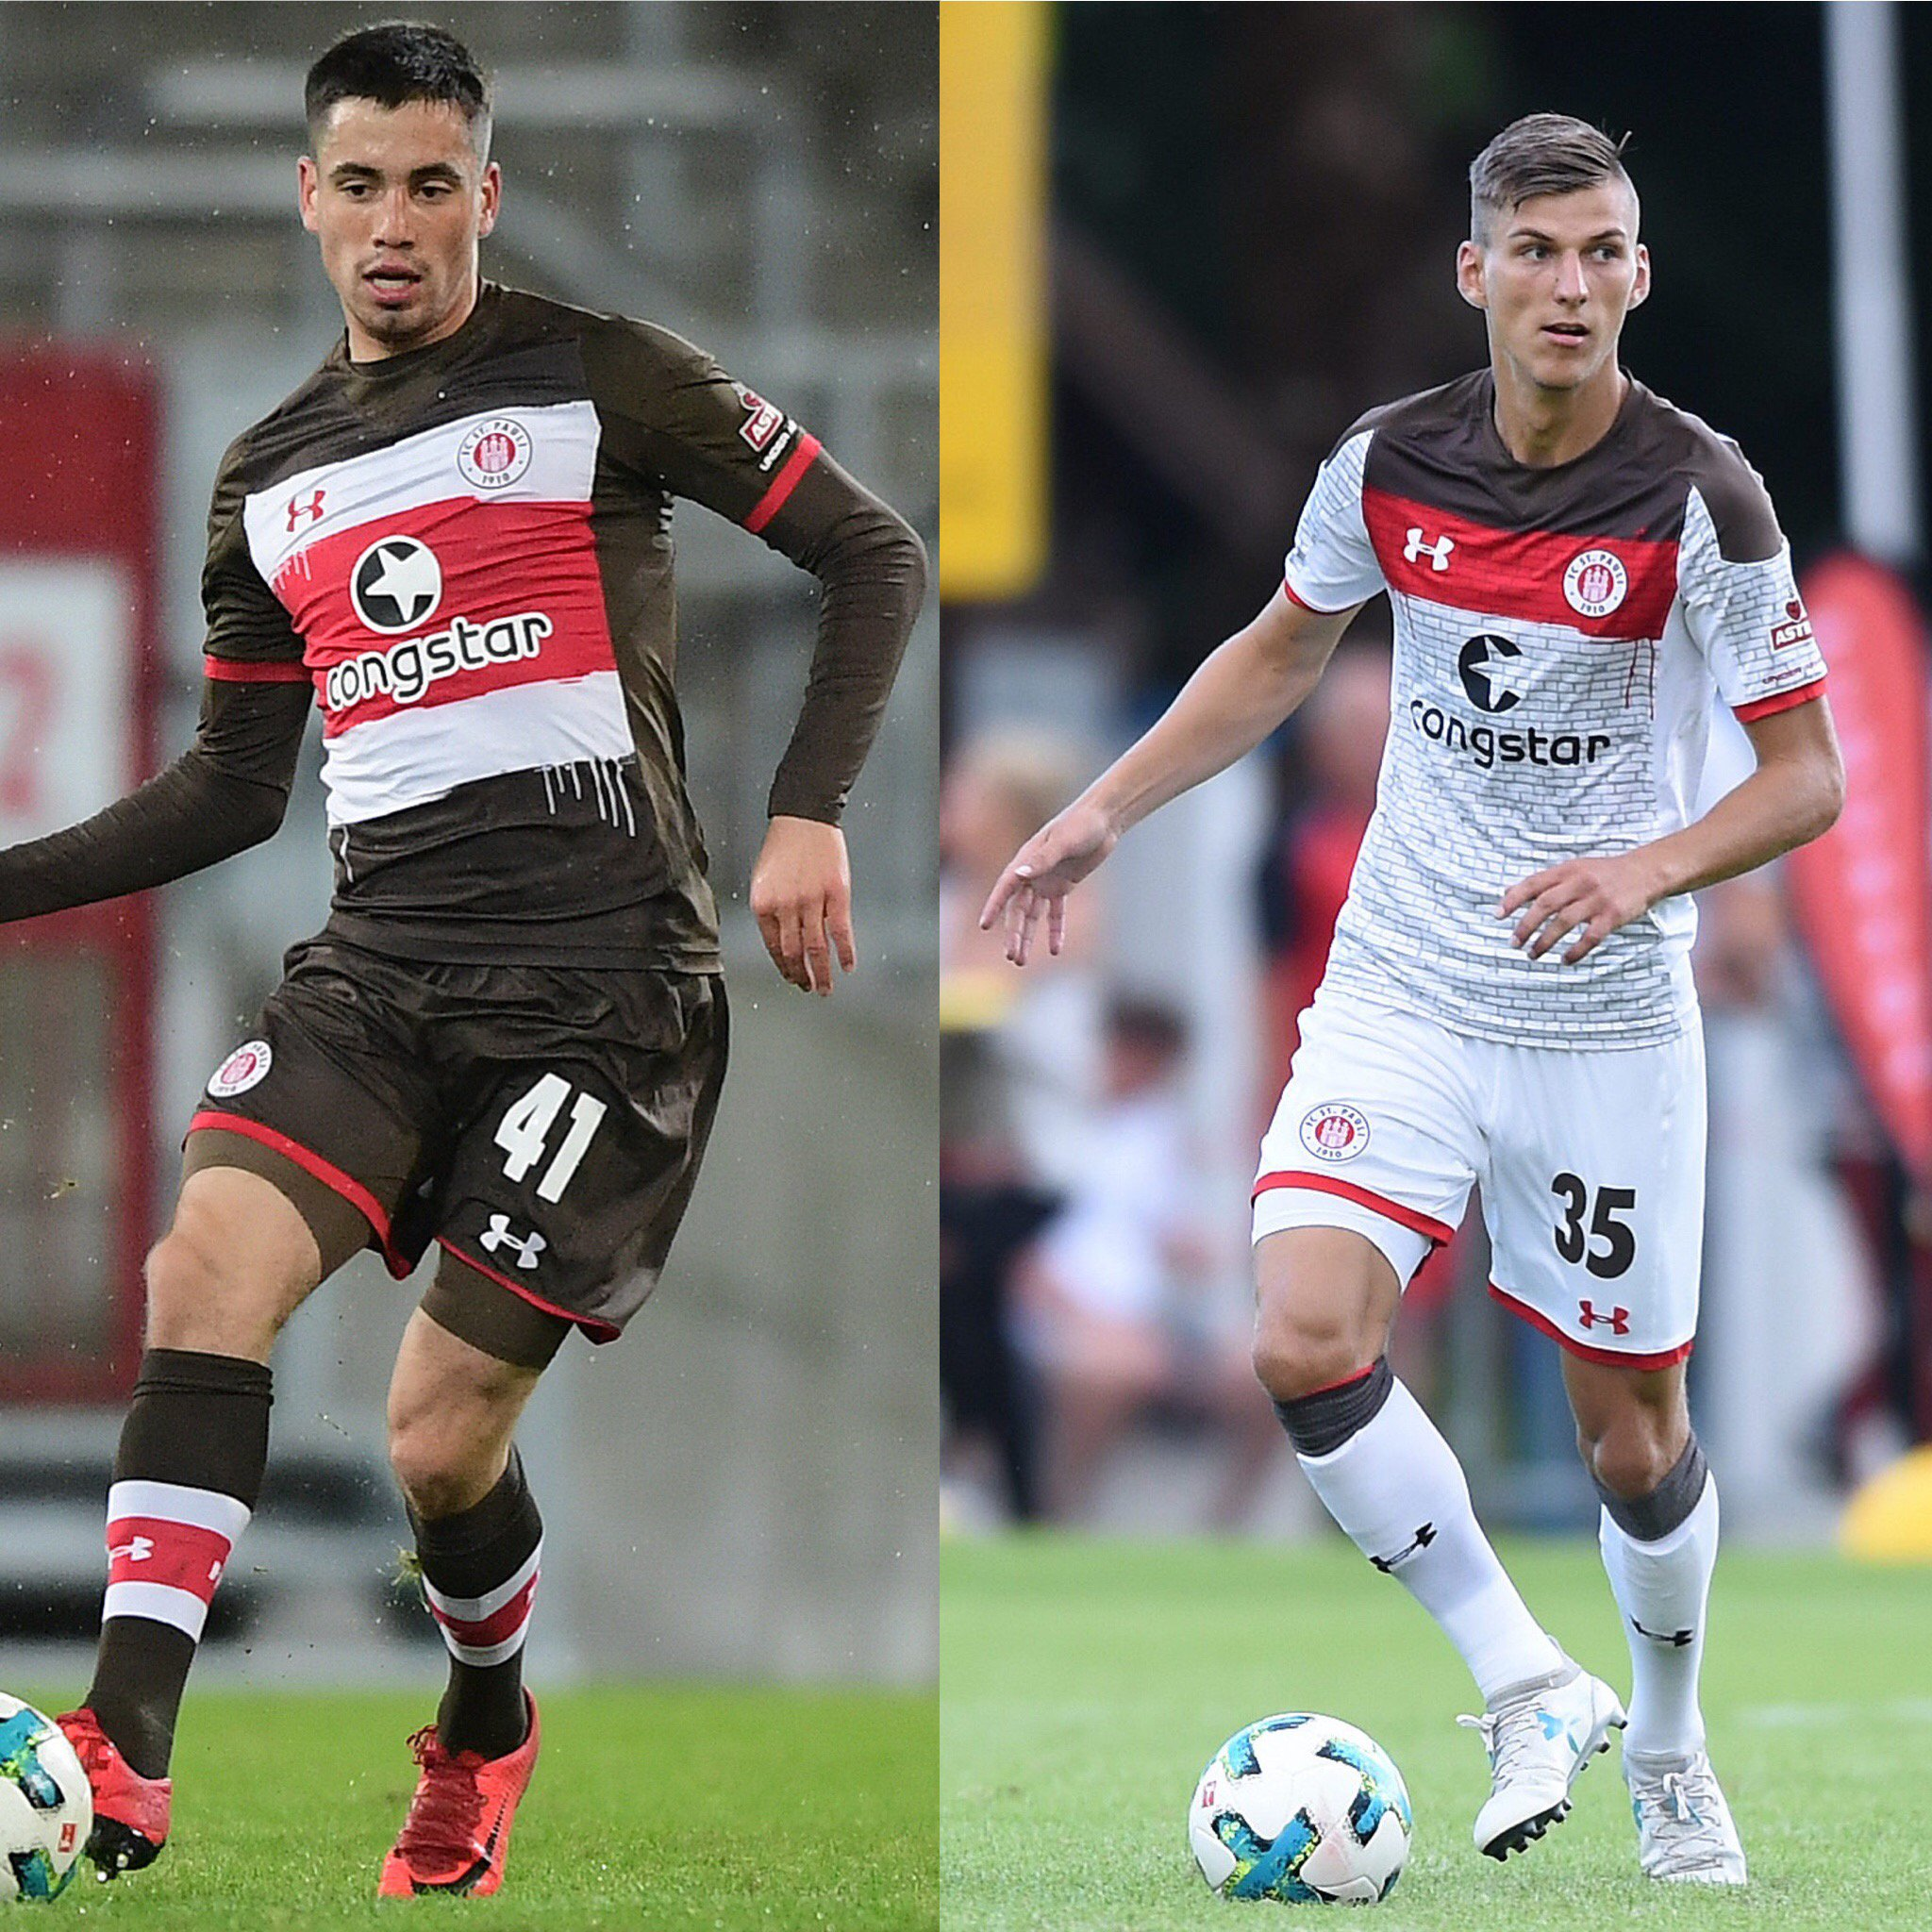 Spieler St Pauli